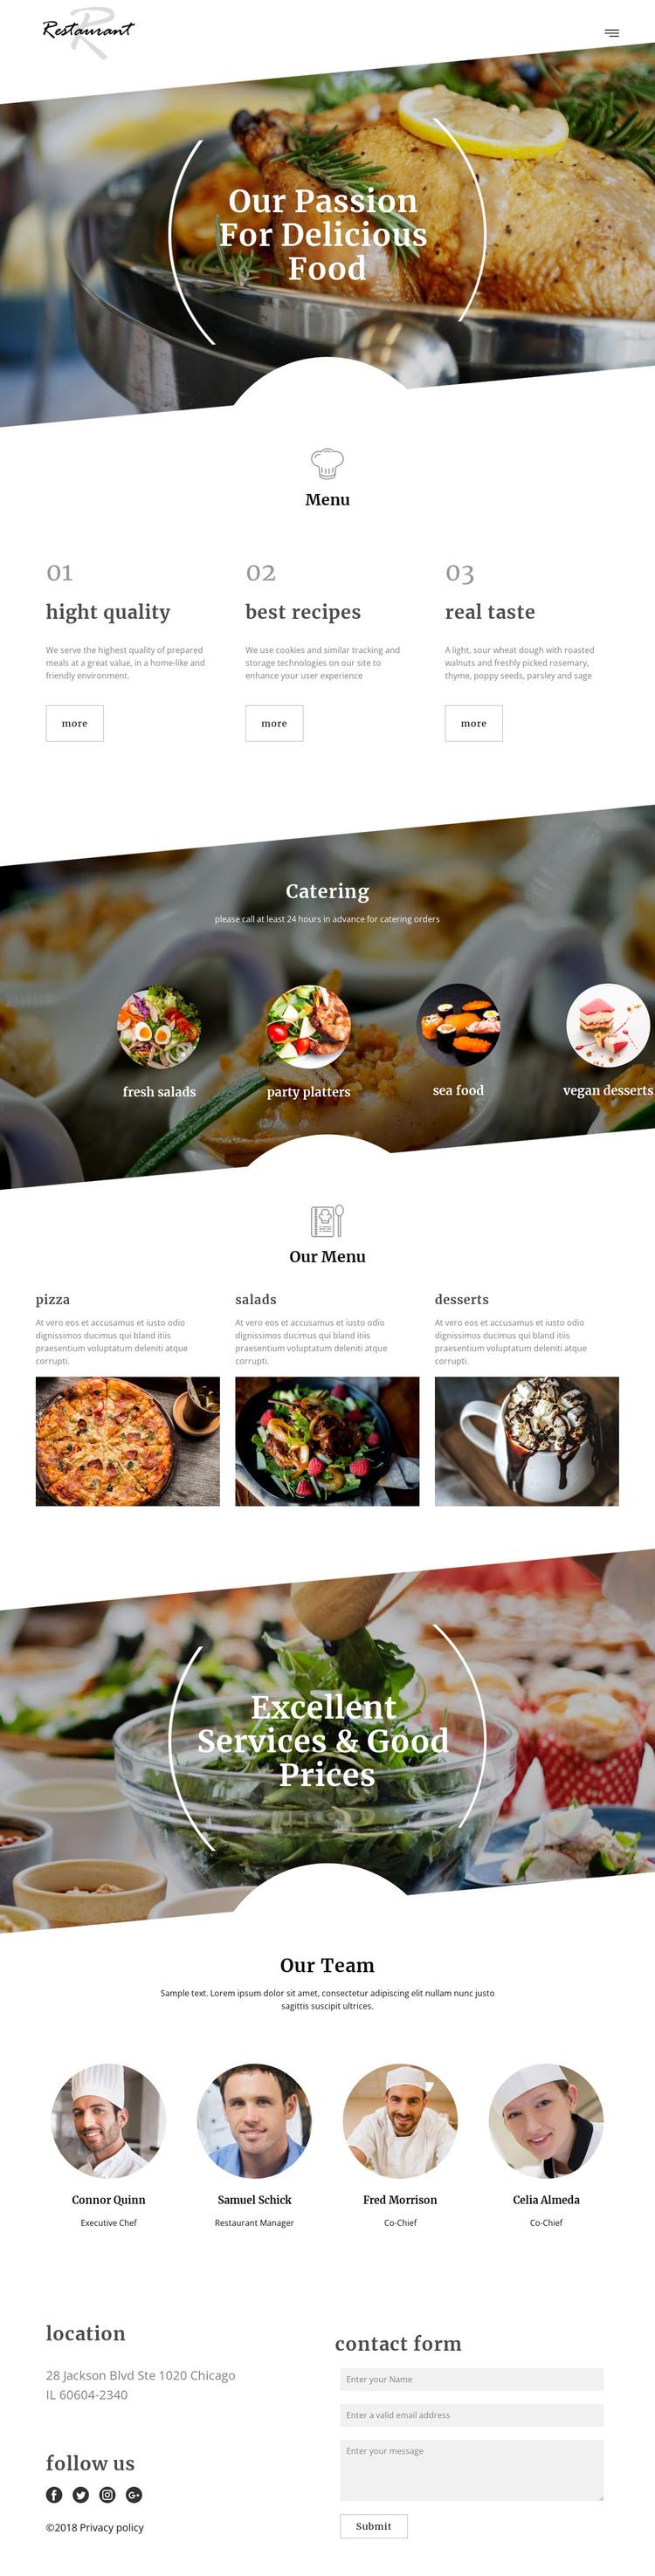 Executive chef recipes WordPress Theme